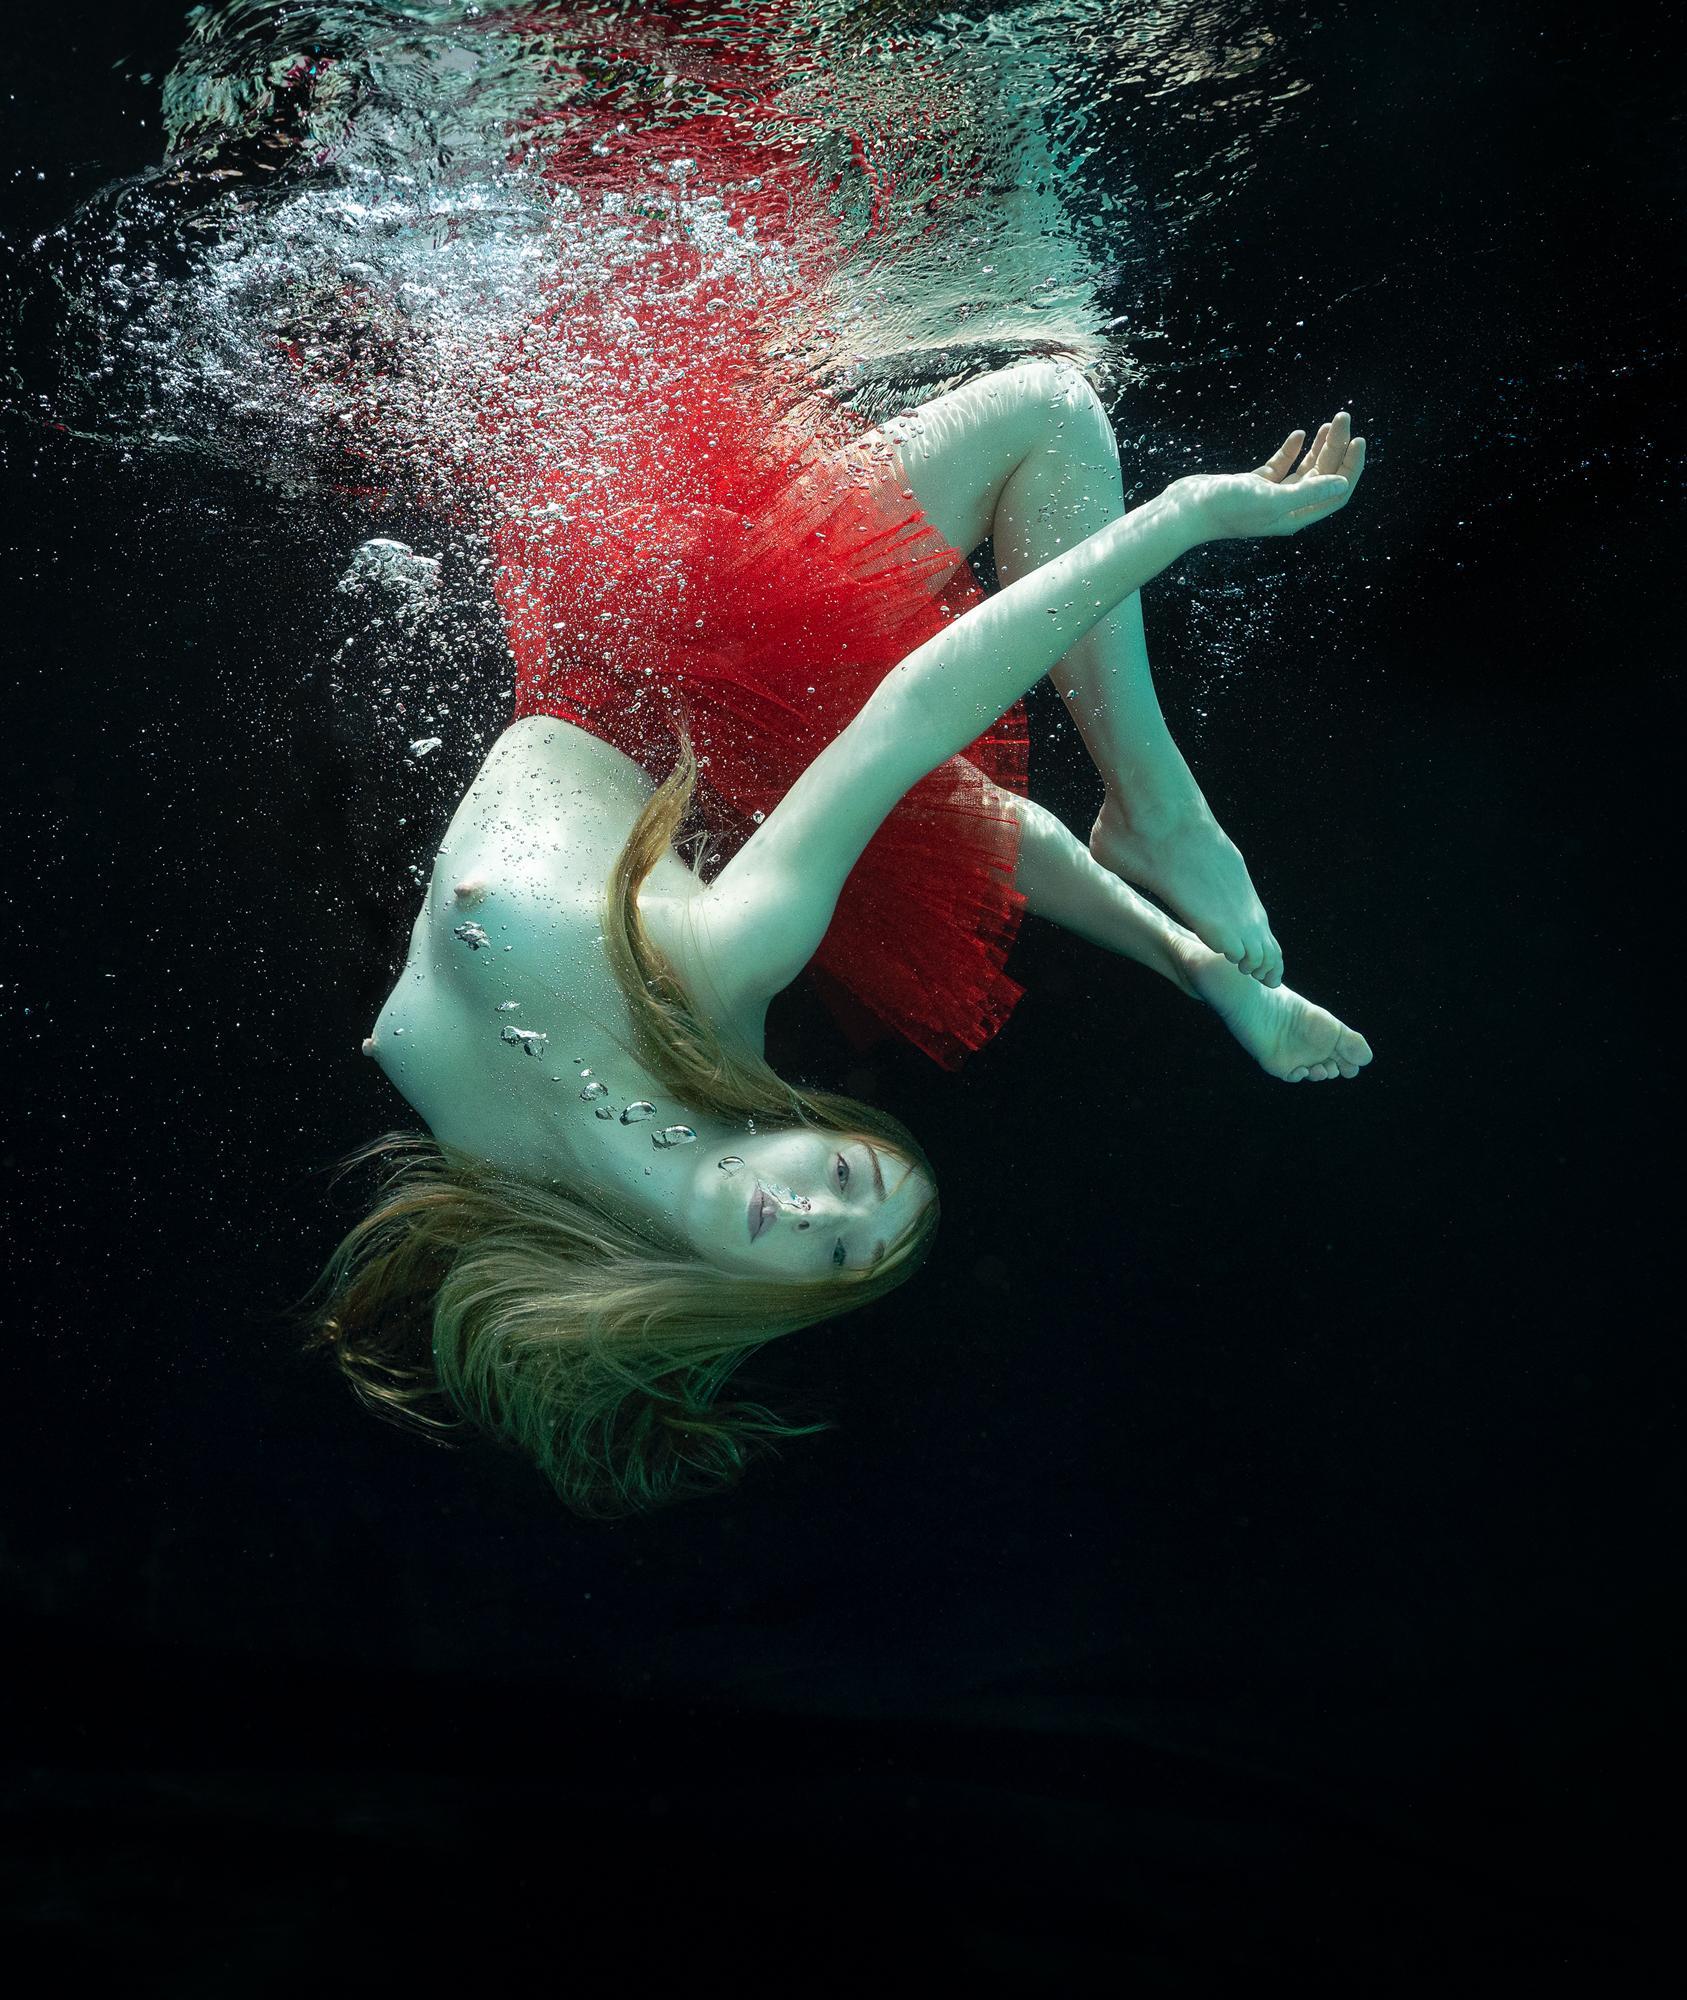 Red Pretzel - underwater nude photograph - print on paper